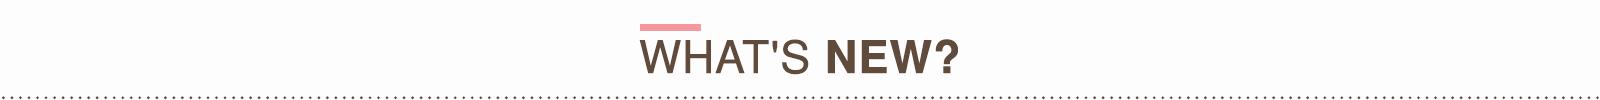 yves-rocher-flagship-video-banner